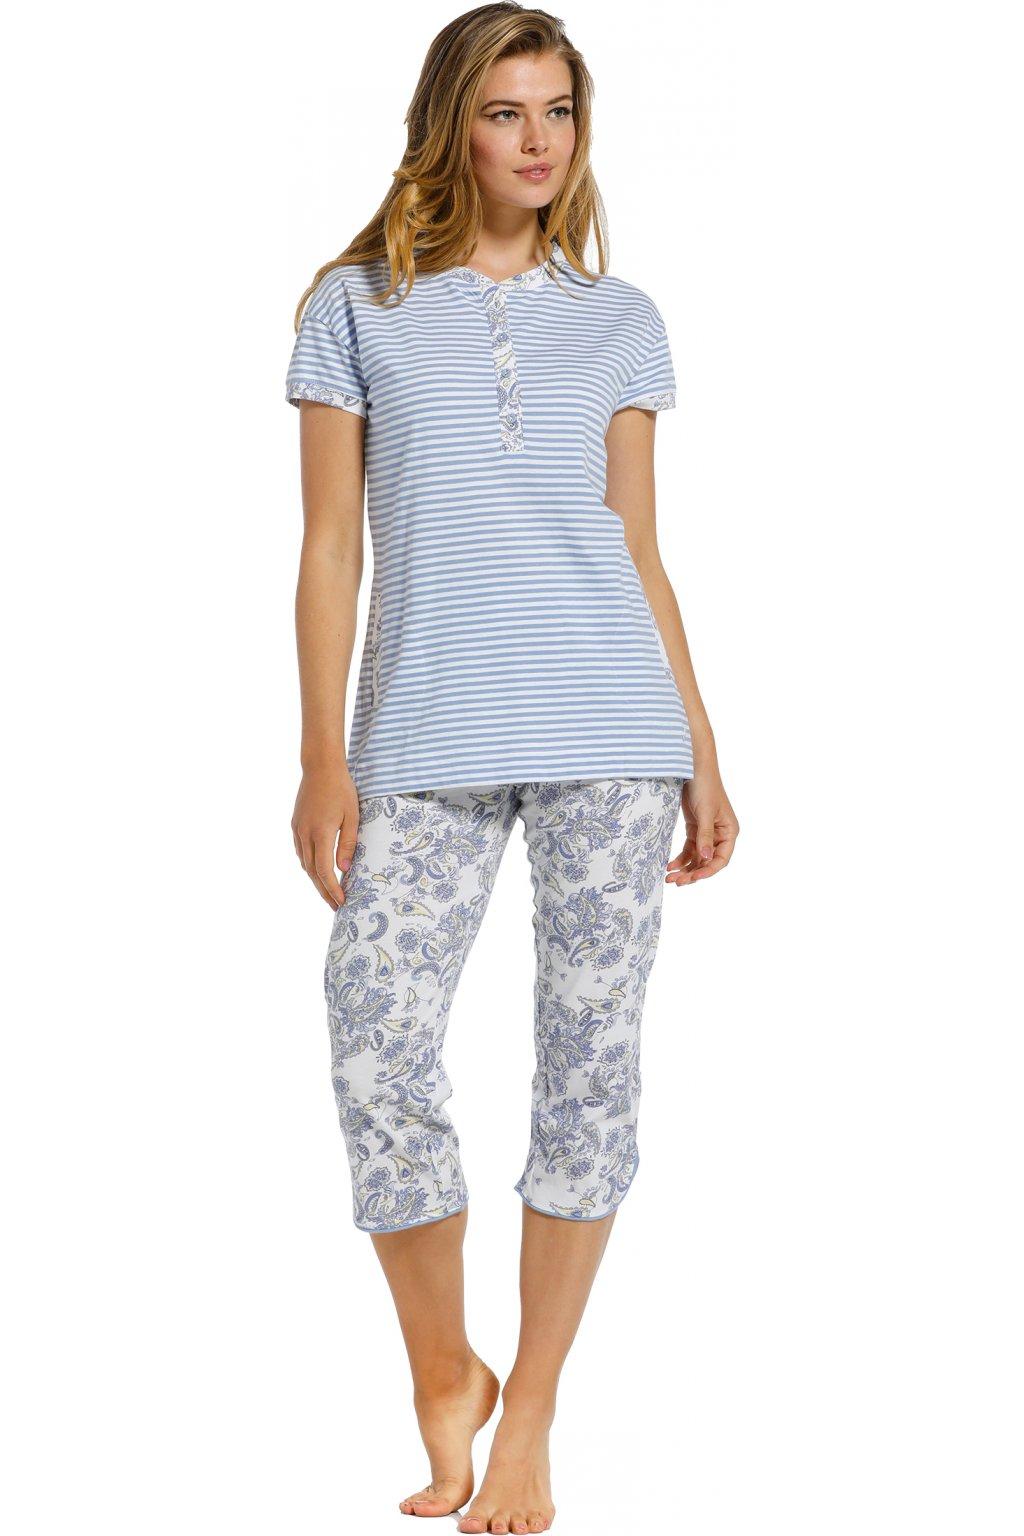 dámske bledomodré pyžamo